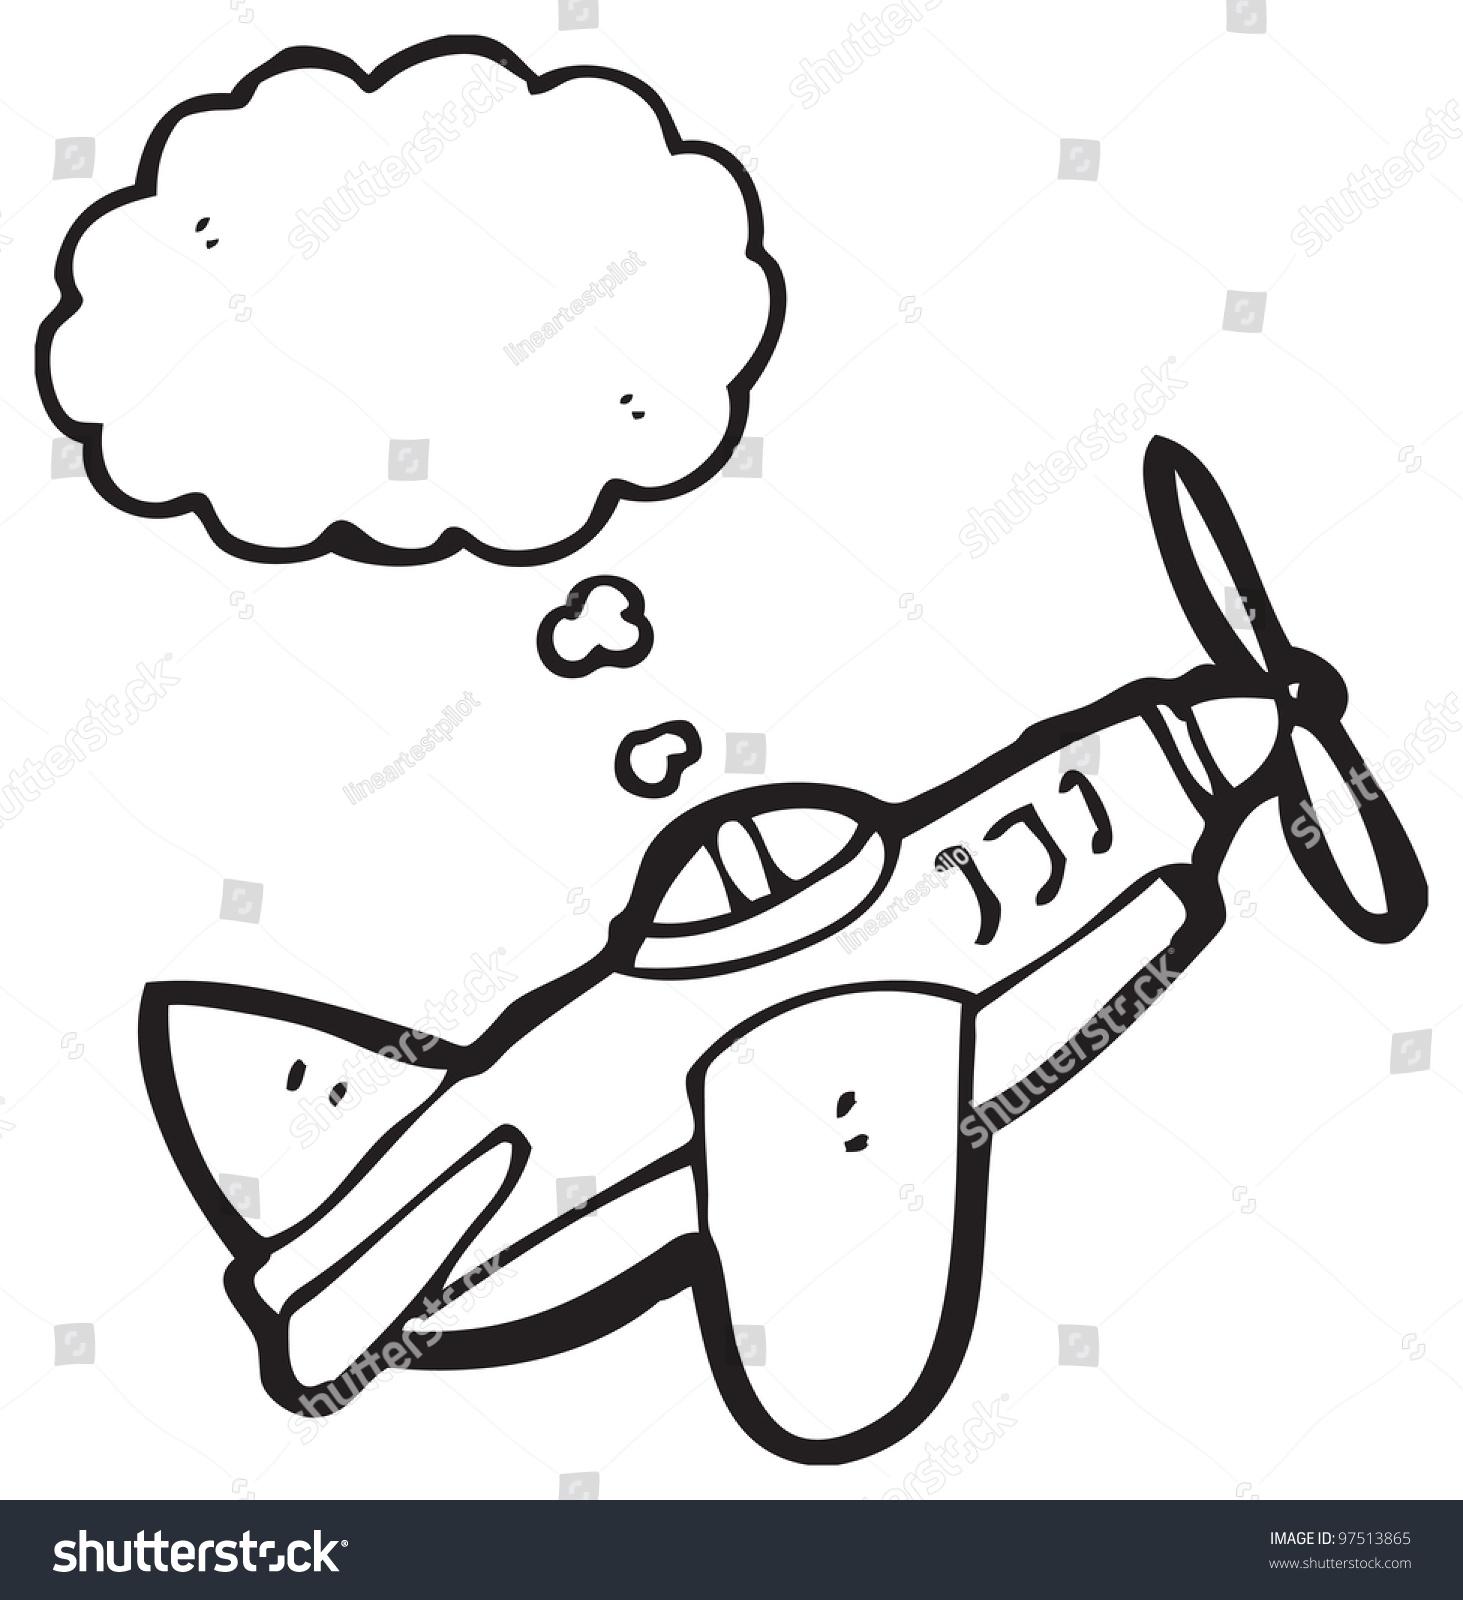 1463x1600 Cartoon Airplane Drawing Cartoon Drawing Of Airplane